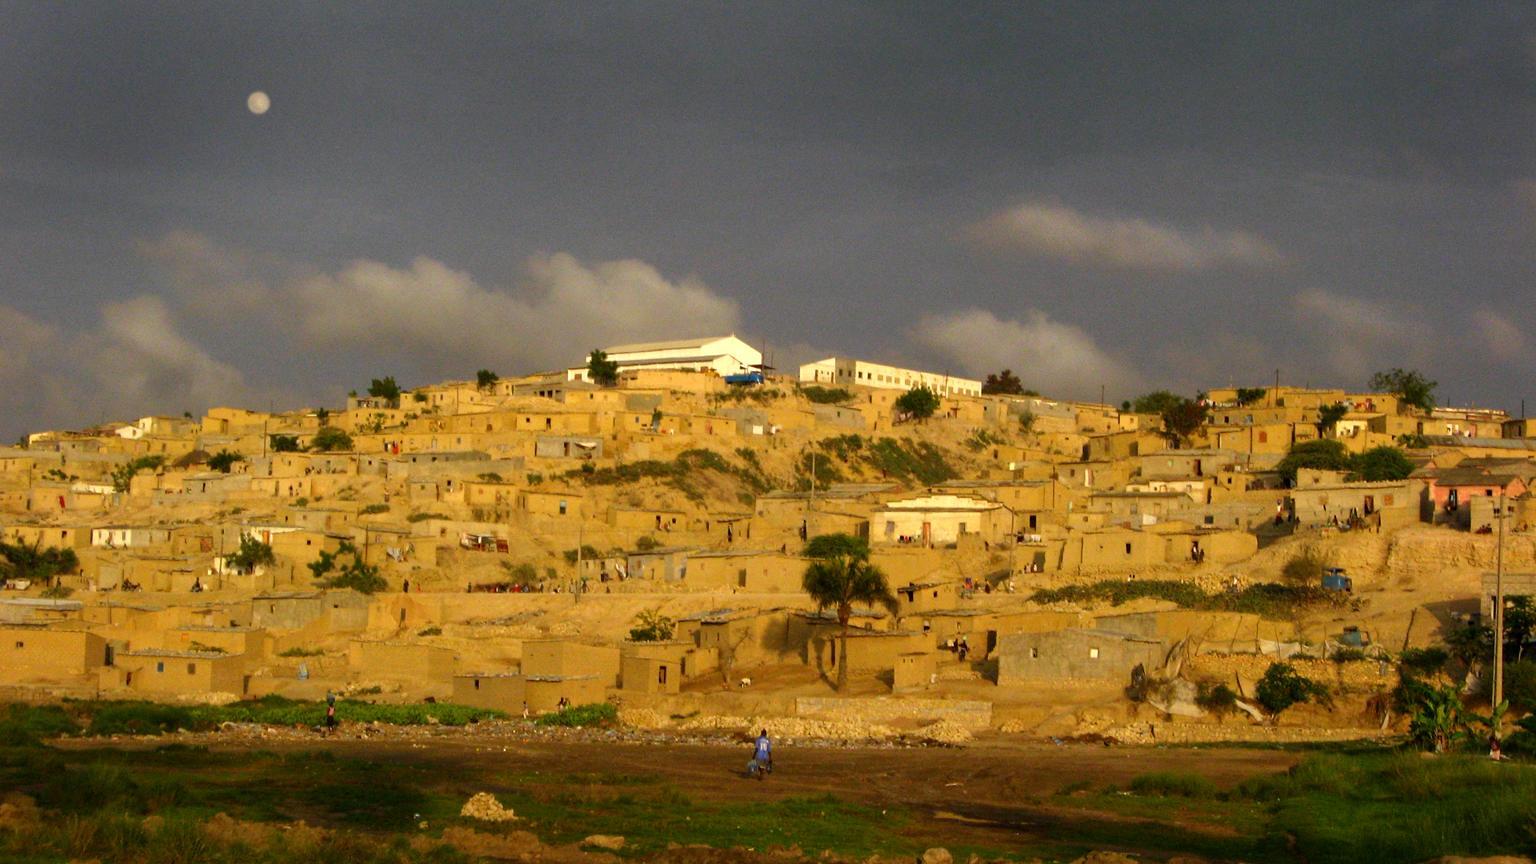 Benguela, Angola, october 2007_photo by Carlos Ebert_FLICKR creative commons